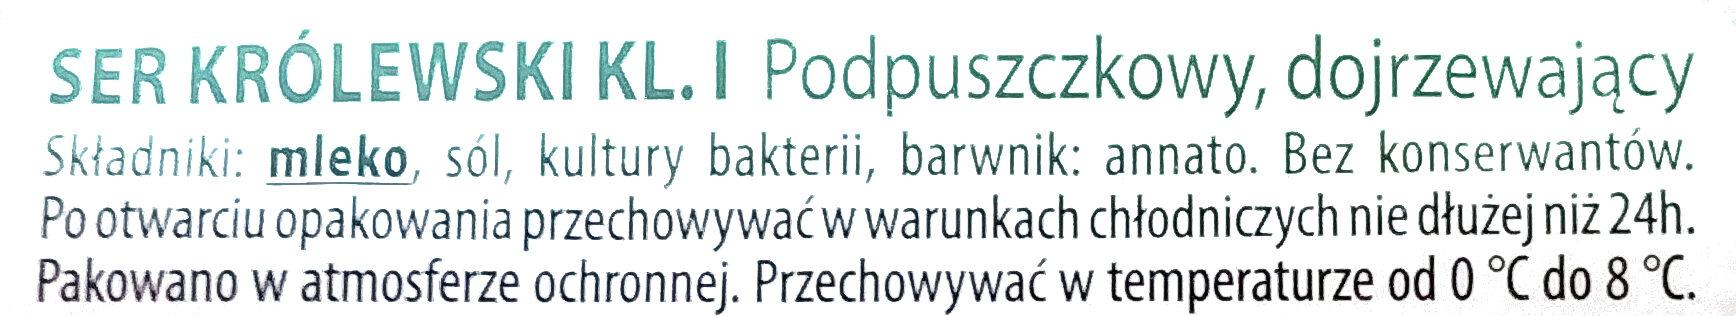 Ser królewski plastry - Składniki - pl